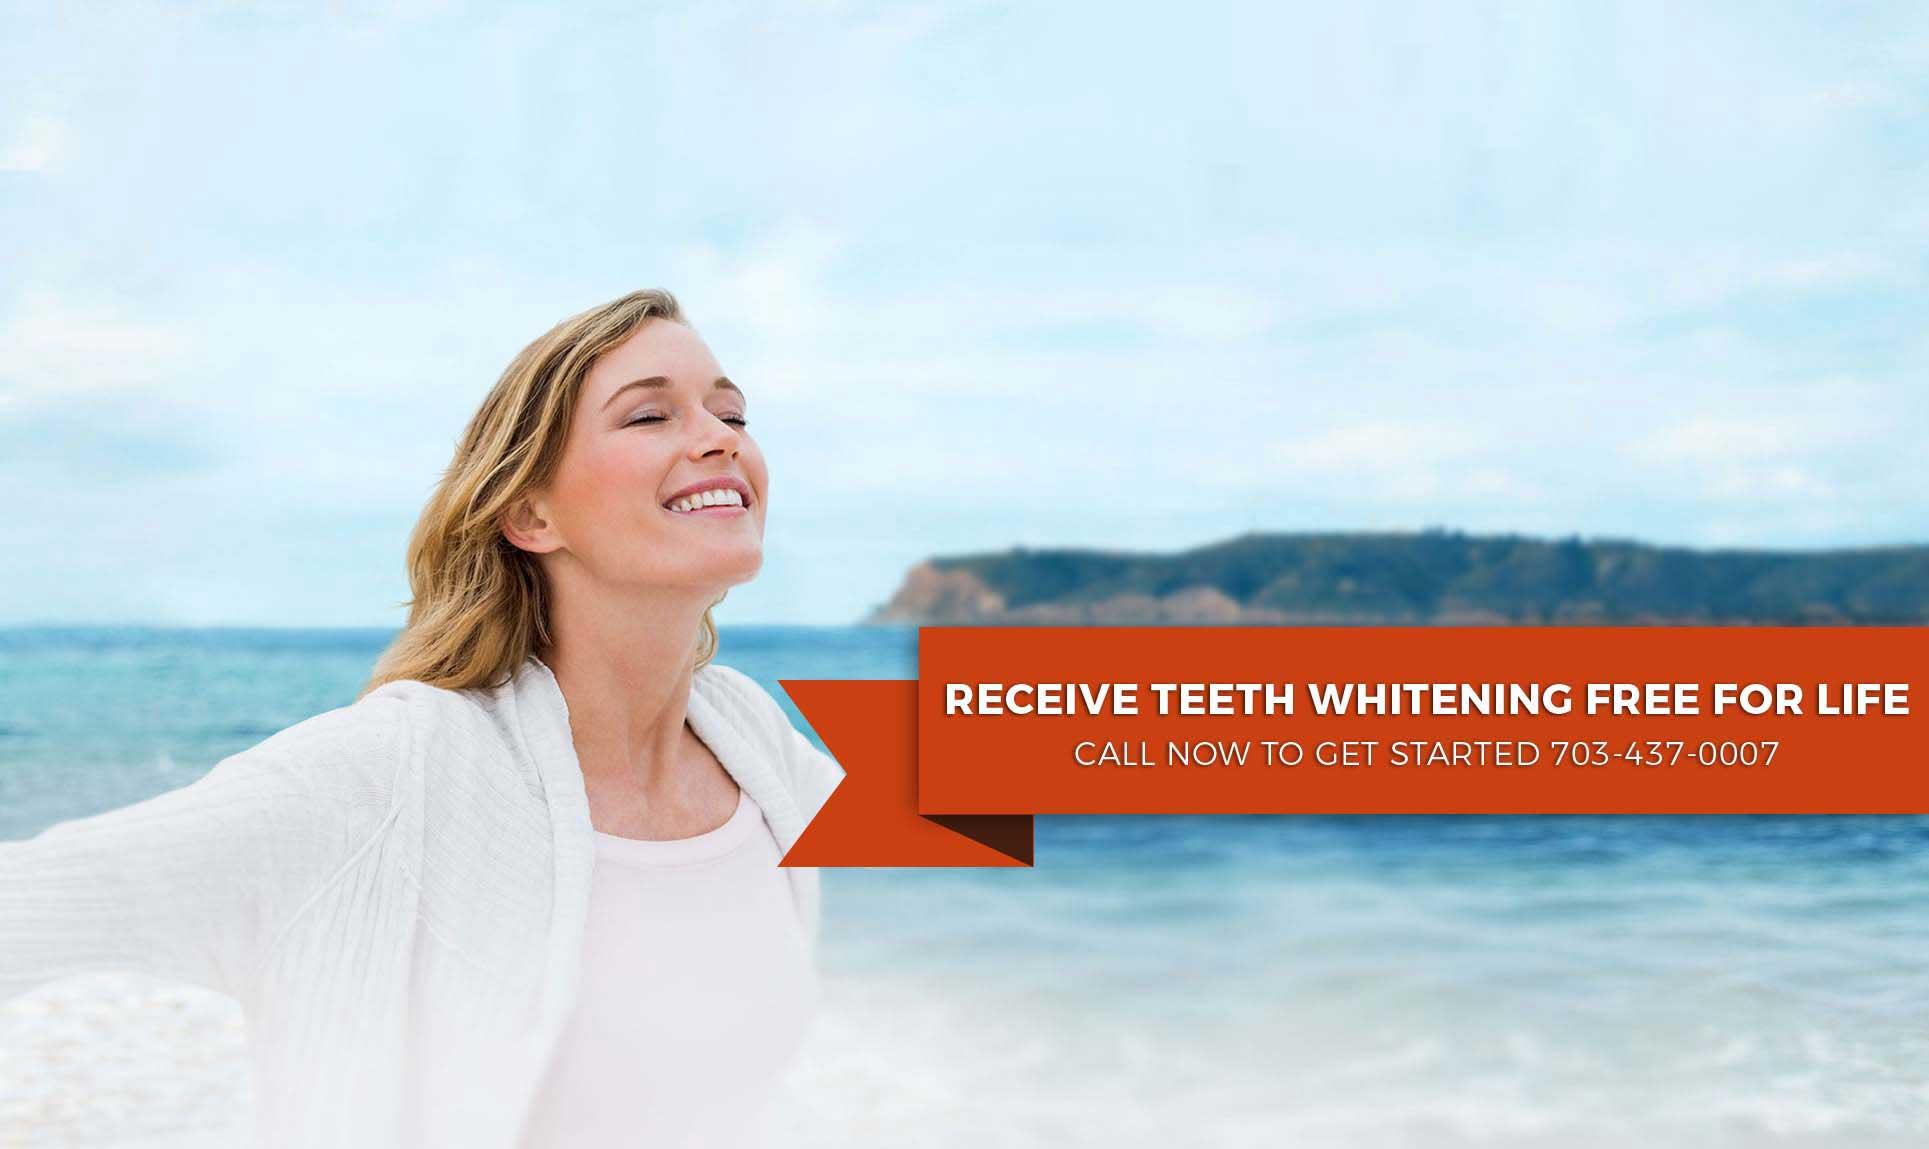 Dental Clinic Reston Virginia – RTC Smiles